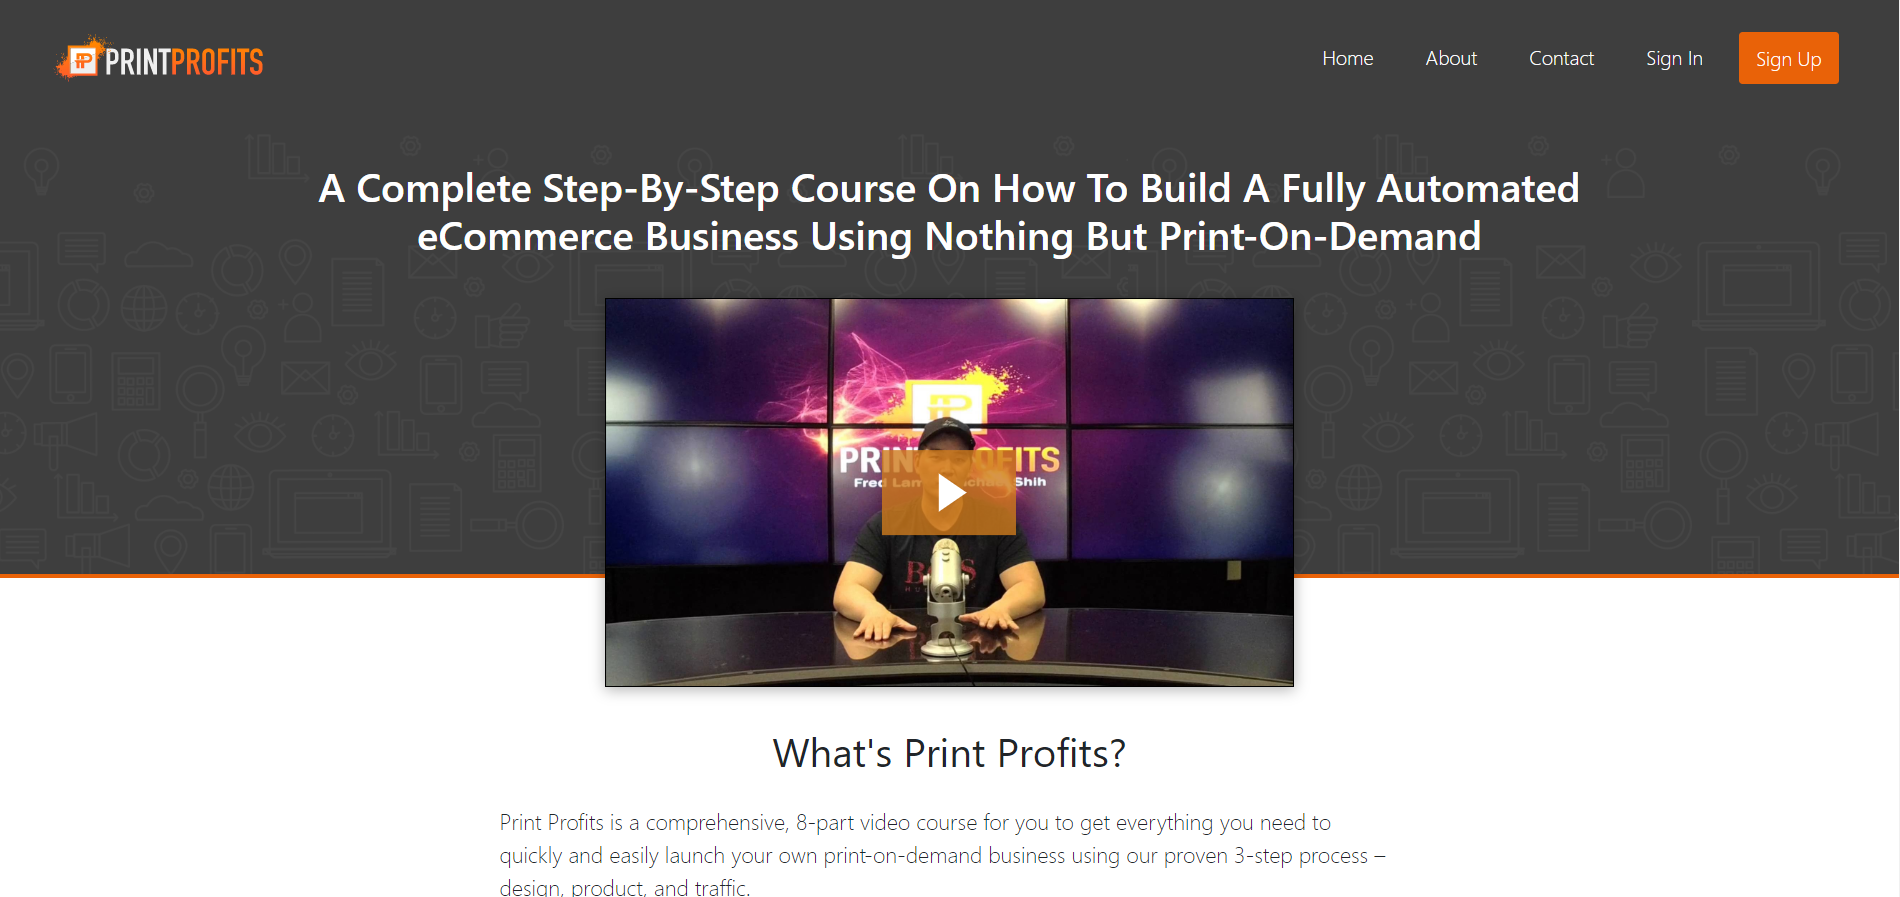 print profits scam